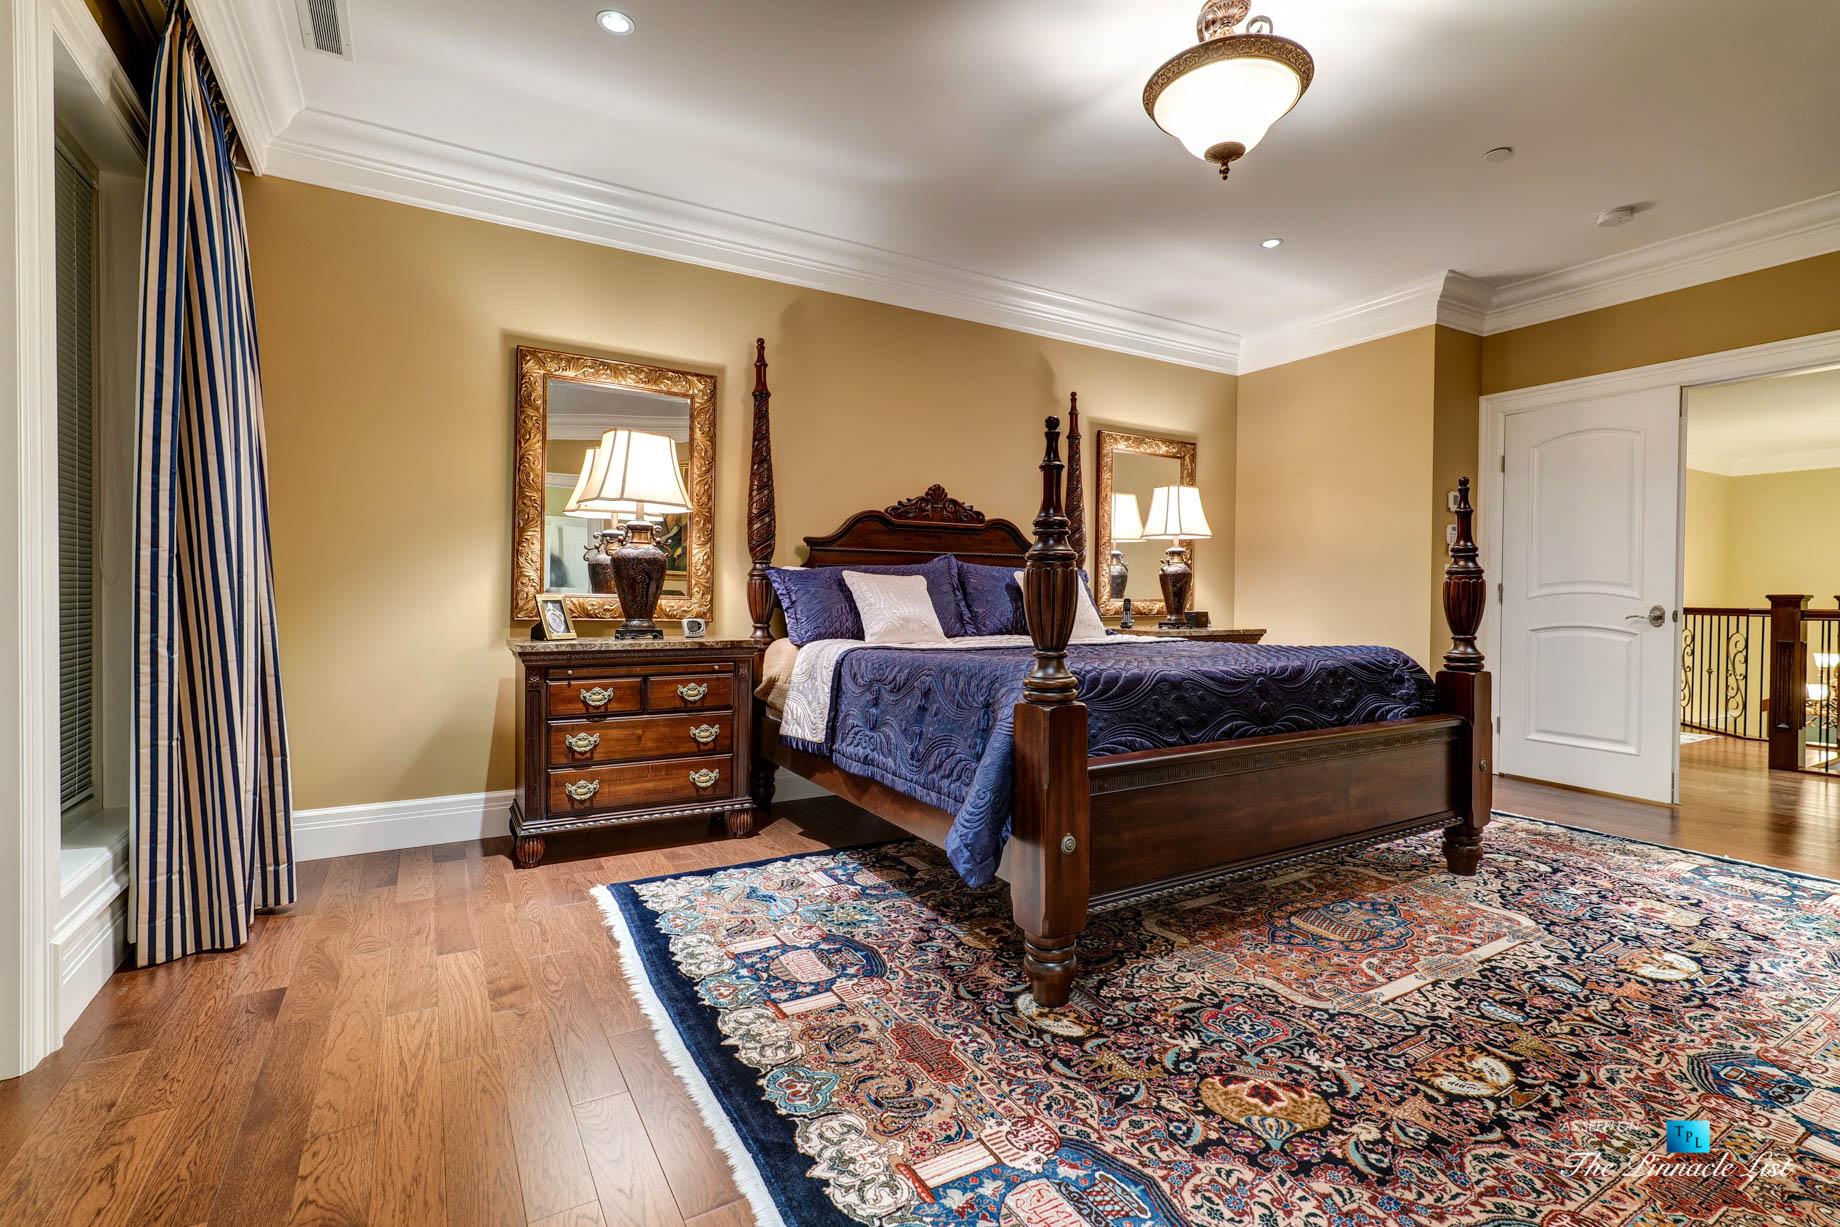 Pinnacle Ridge Luxury Estate - 2057 Ridge Mountain Dr, Anmore, BC, Canada - Master Bedroom